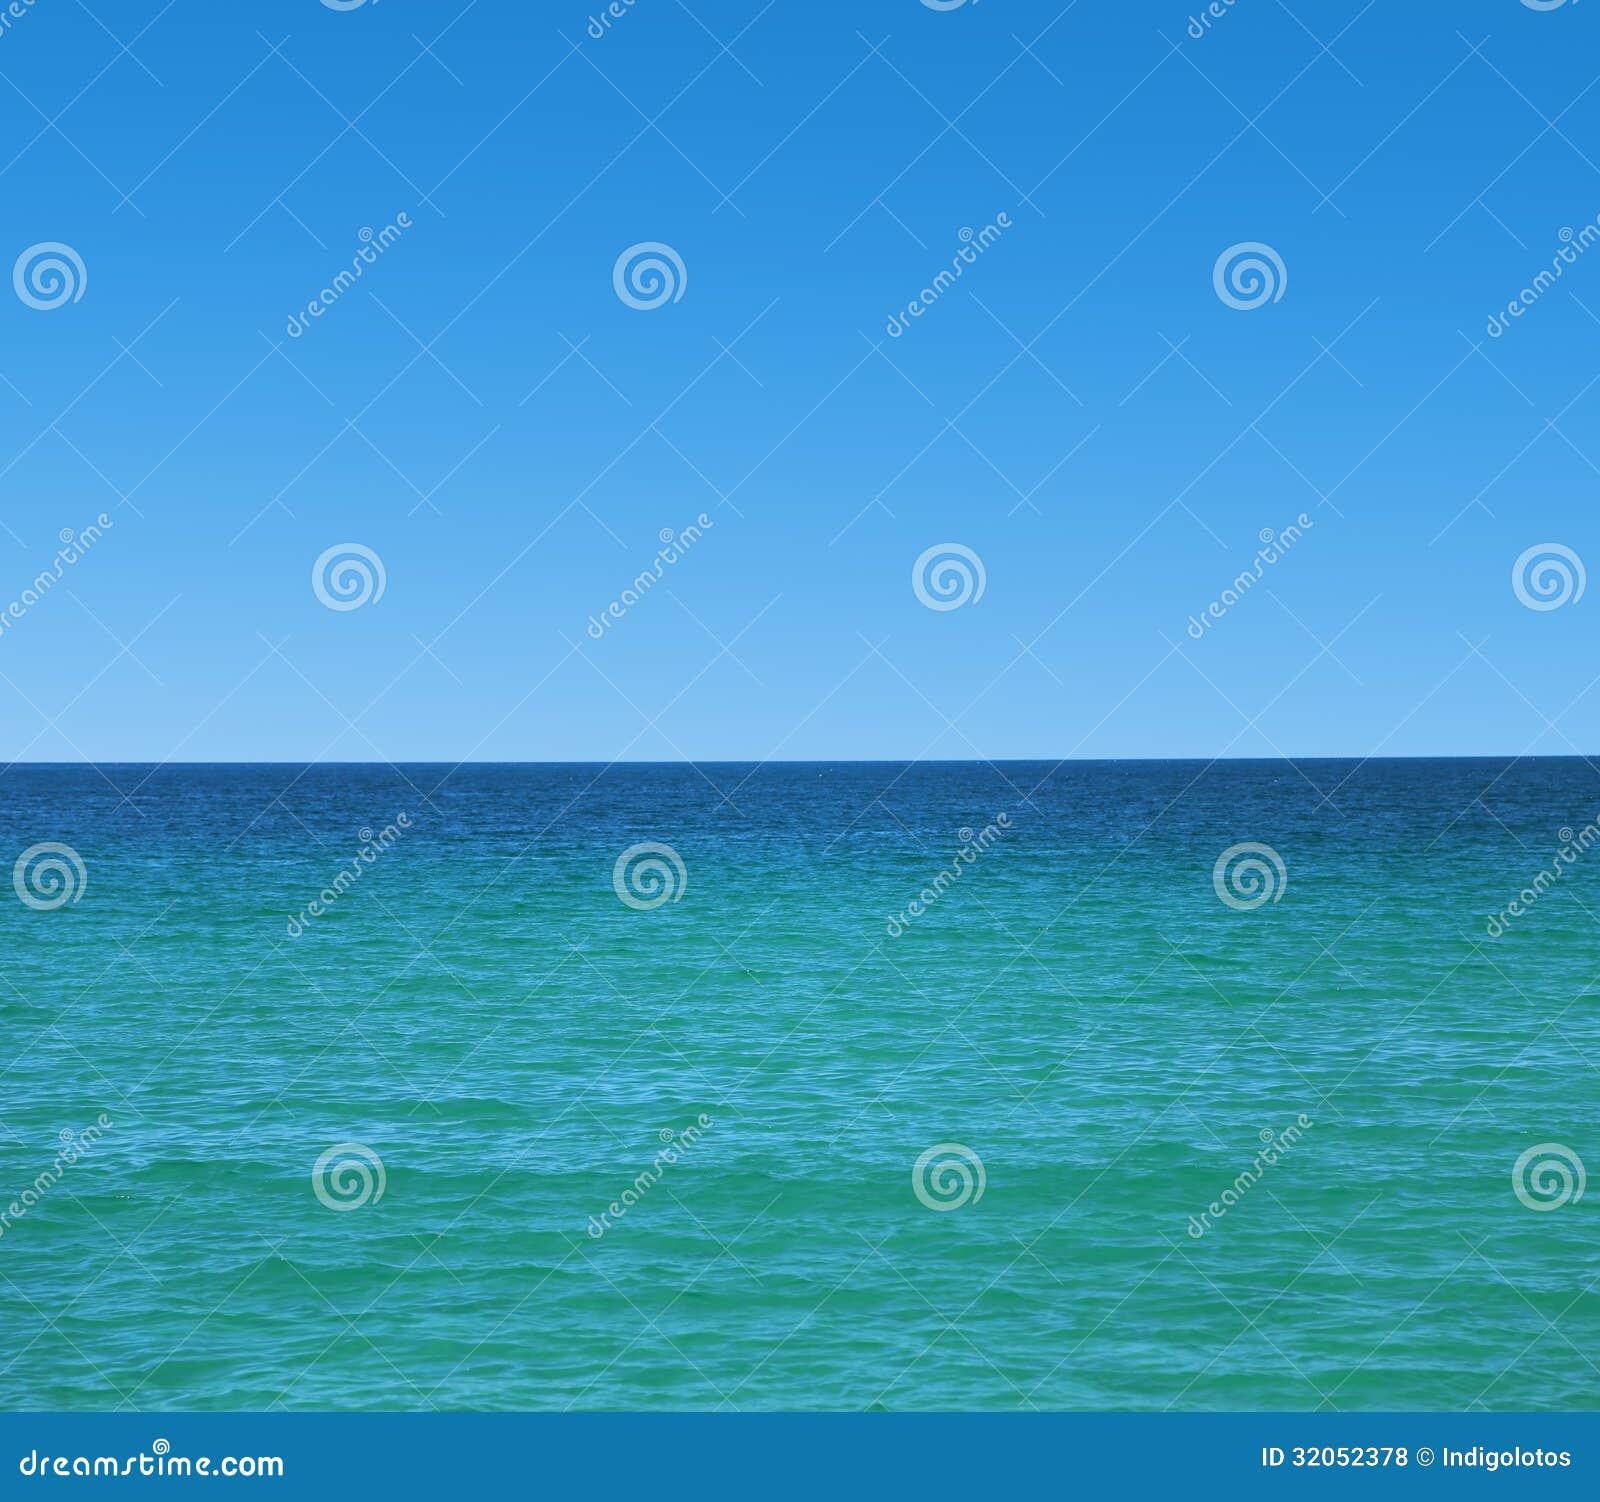 Mer calme et ciel clair bleu photos libres de droits image 32052378 - Image ciel bleu clair ...